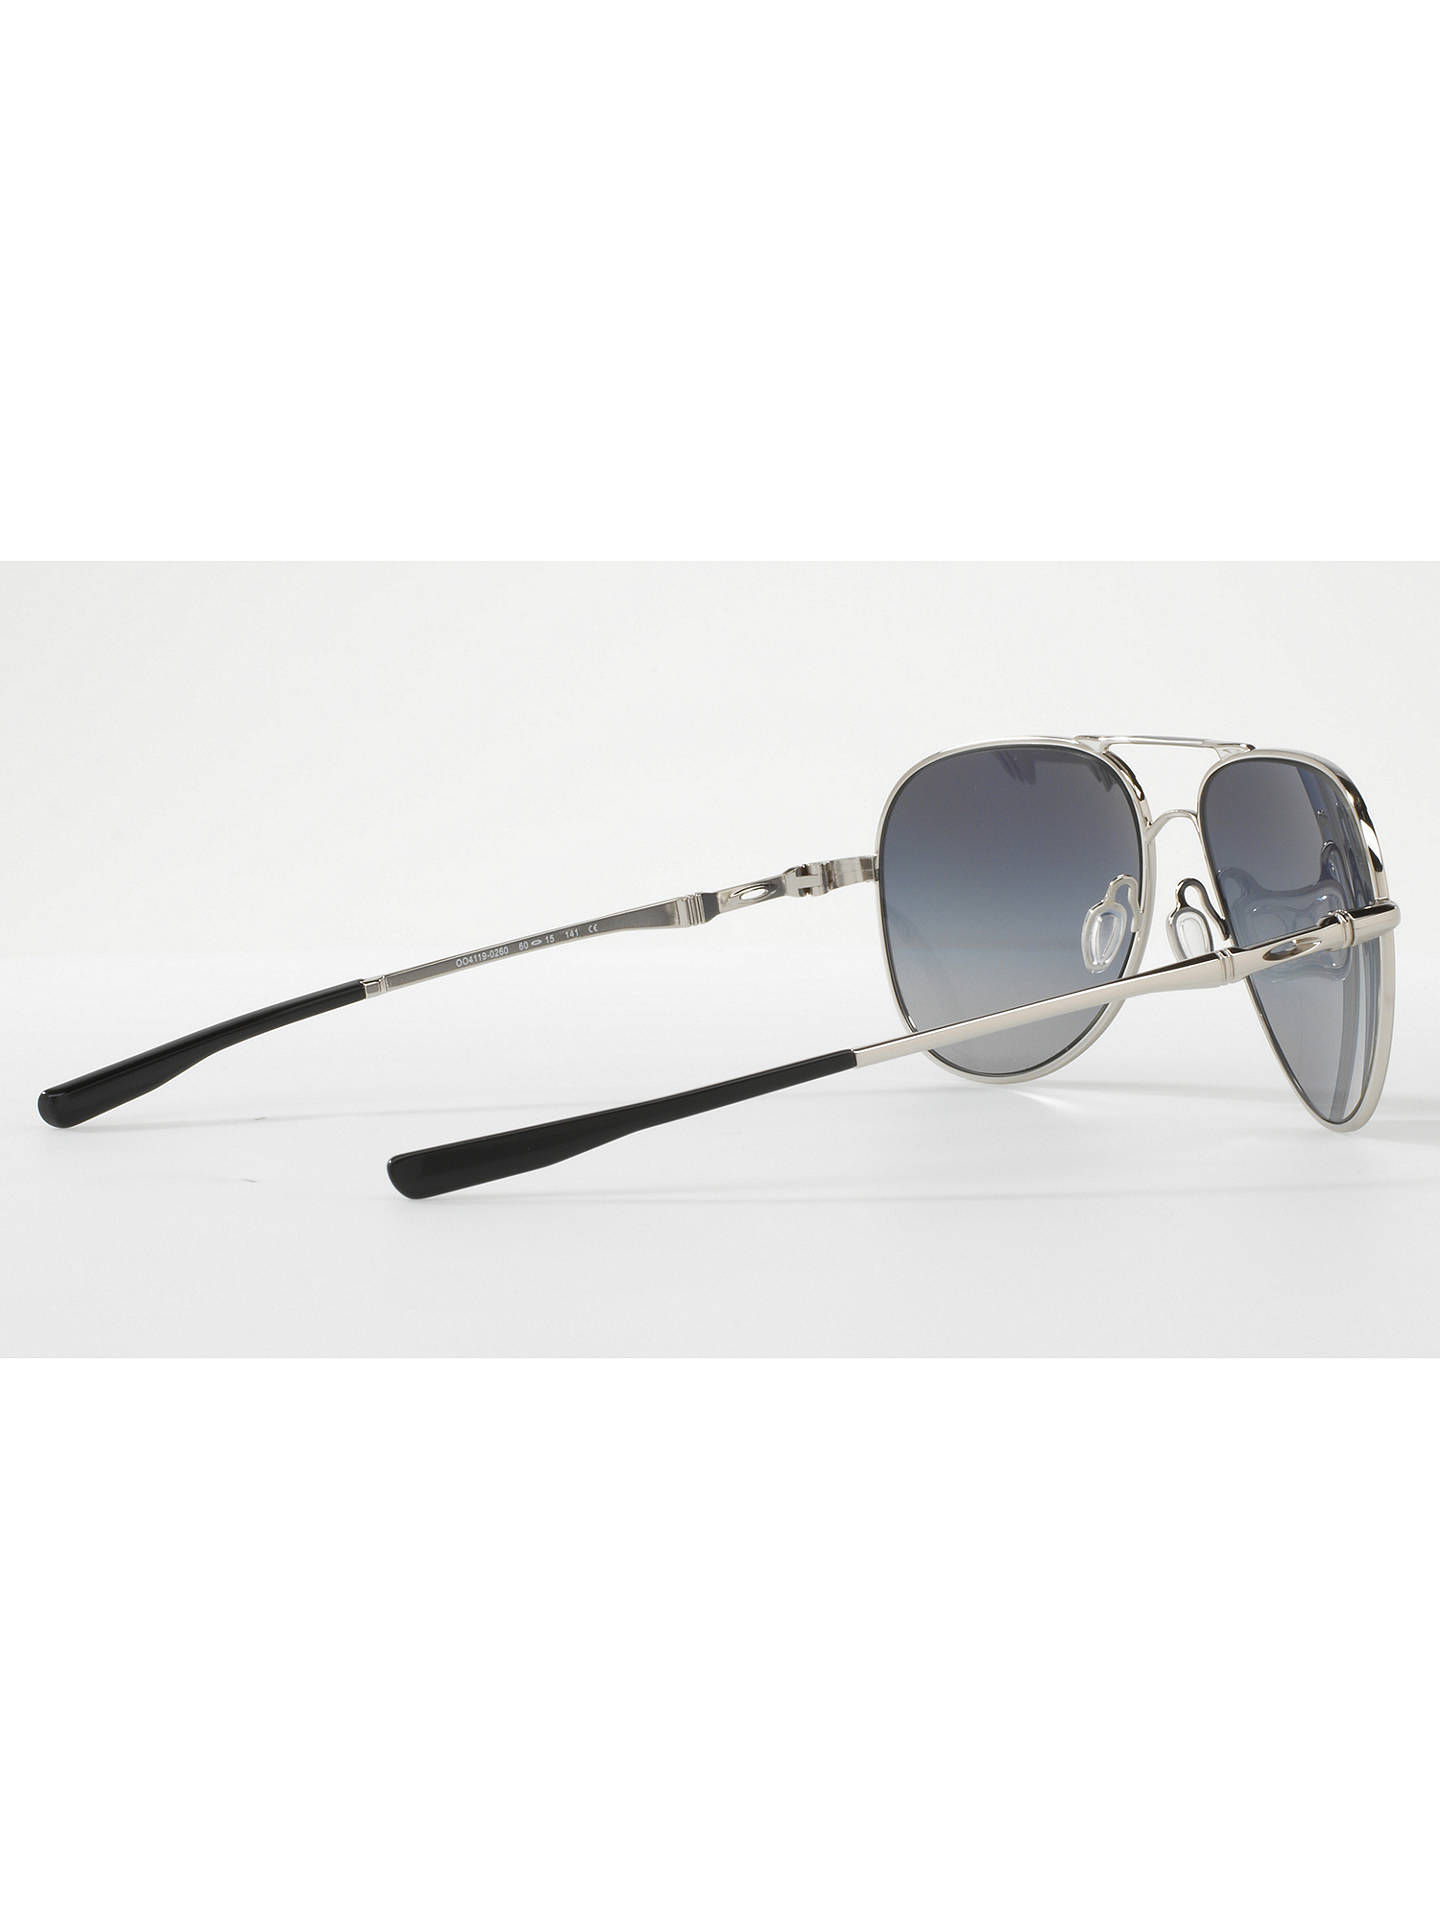 3dbda4bfa3 ... Buy Oakley OO4119 Elmont Medium Polarised Aviator Sunglasses